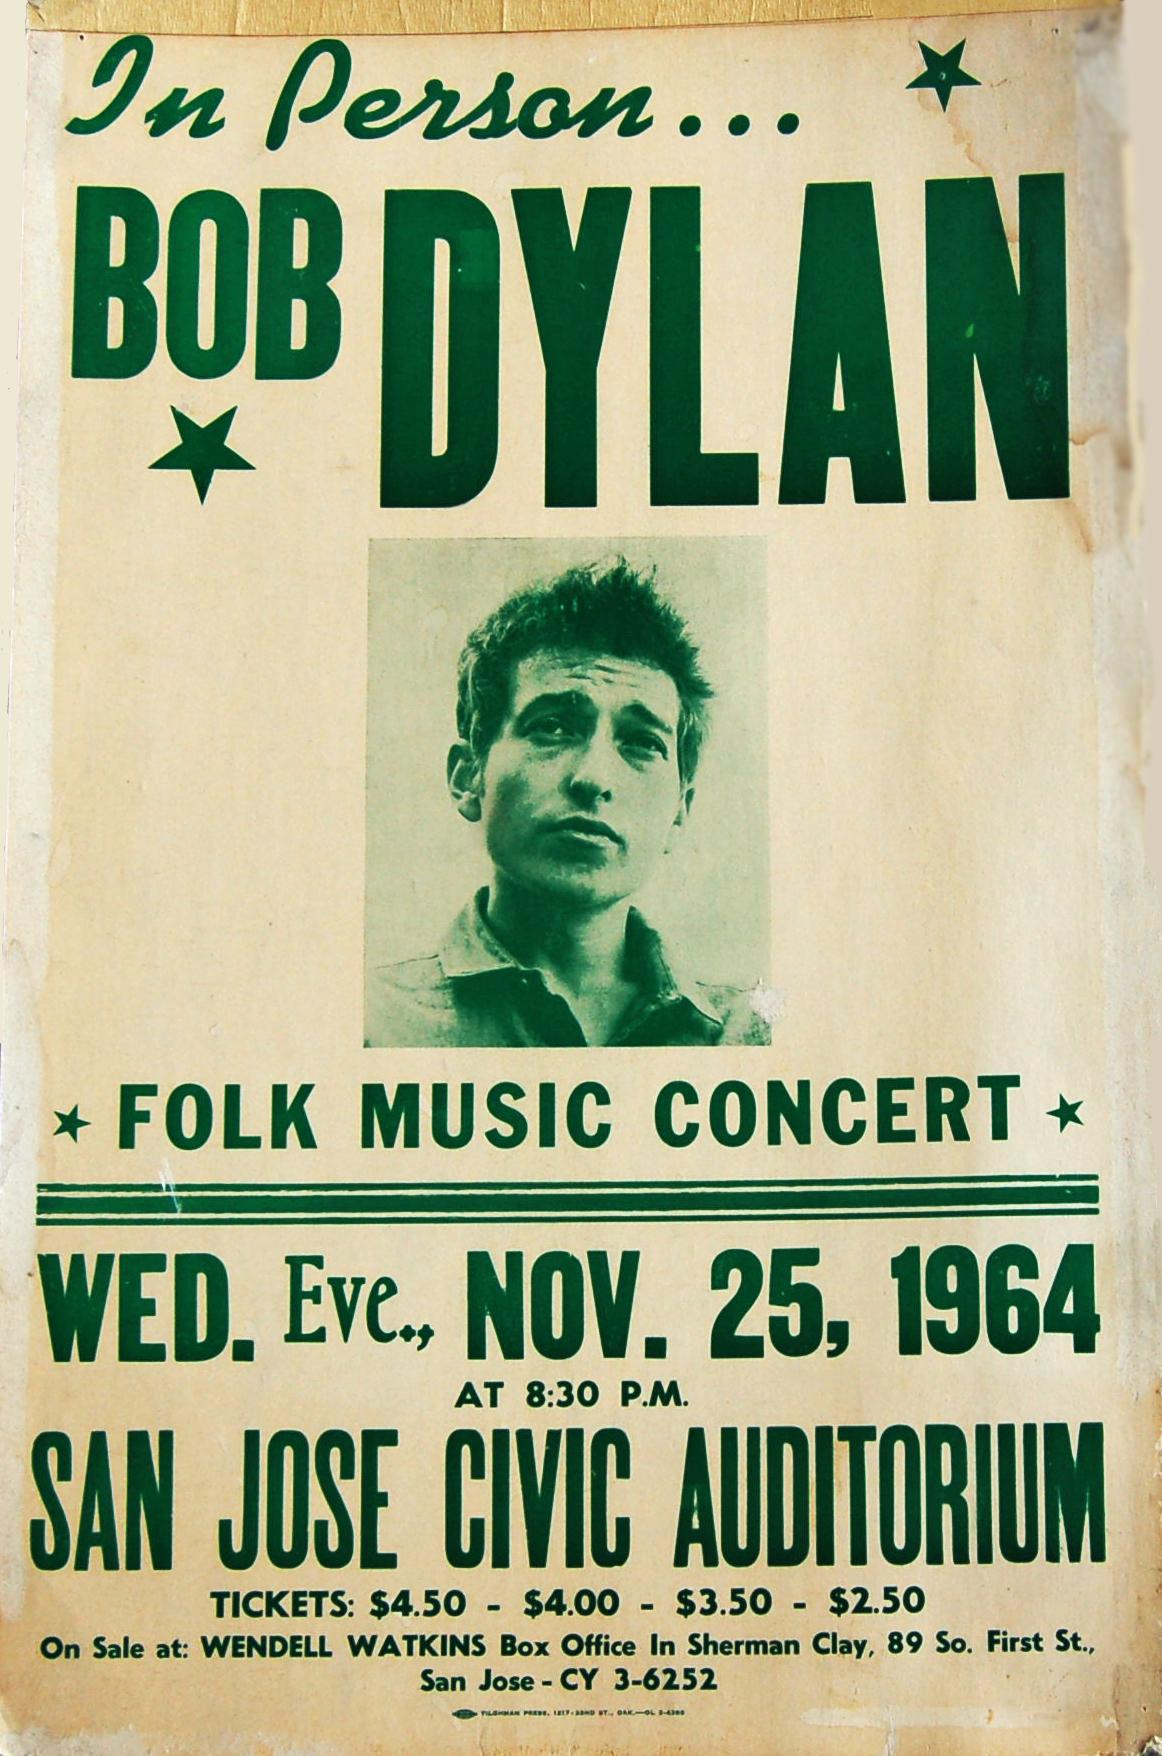 Andrew Hawley from Vintage Rock Posters Seeks 1964 Bob ...